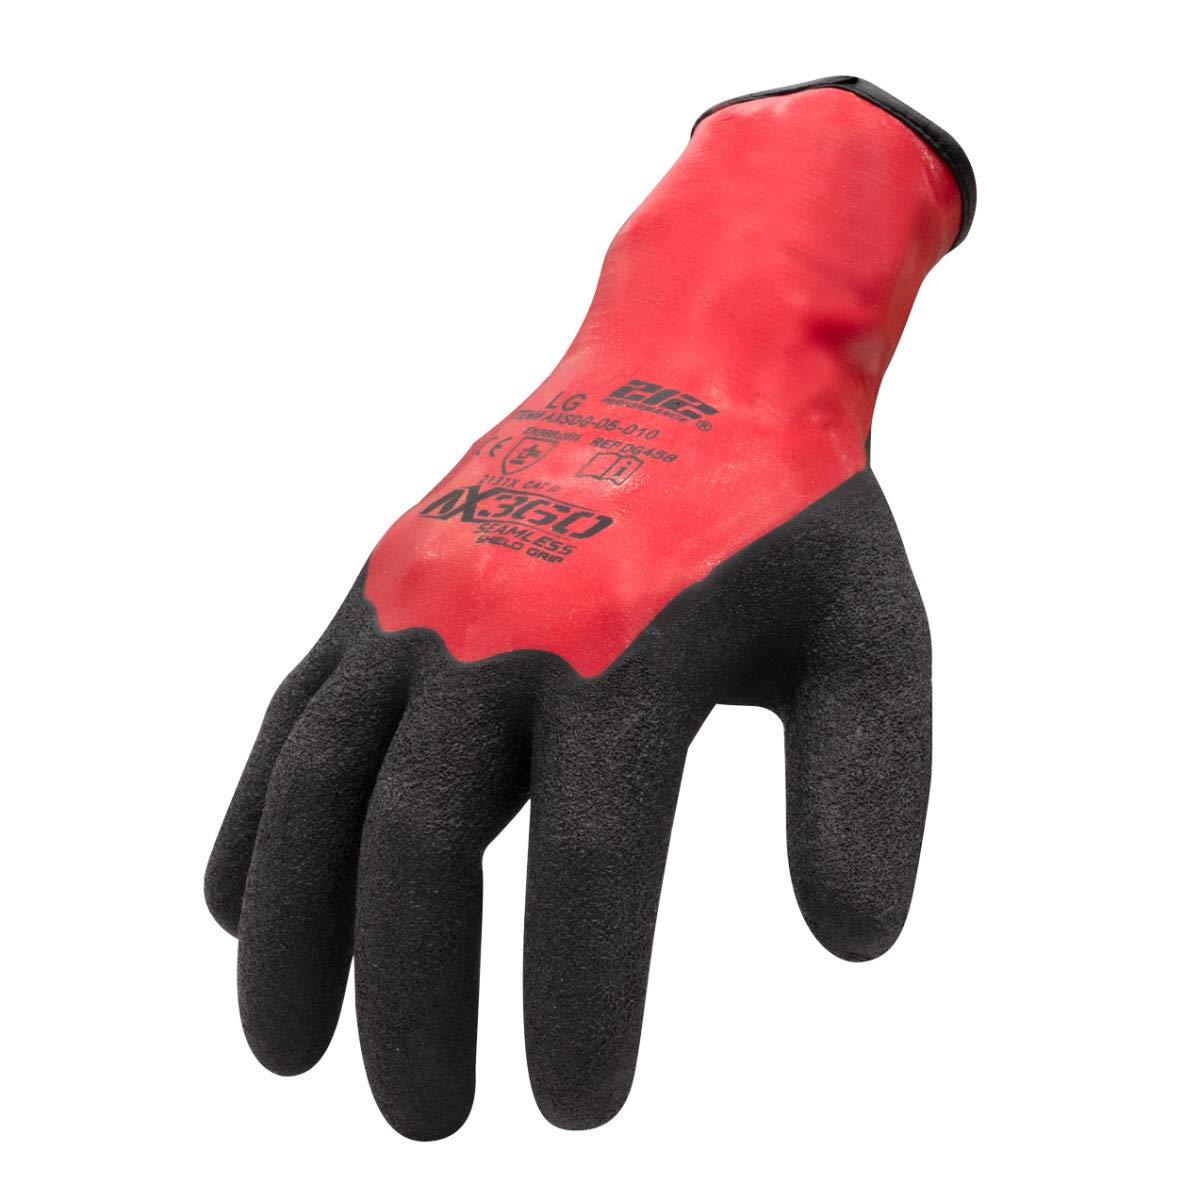 212 Performance Gloves AXSDG-05-011PR AX360 Shield Grip Latex-dipped Gloves, X-Large by 212 Performance Gloves (Image #1)